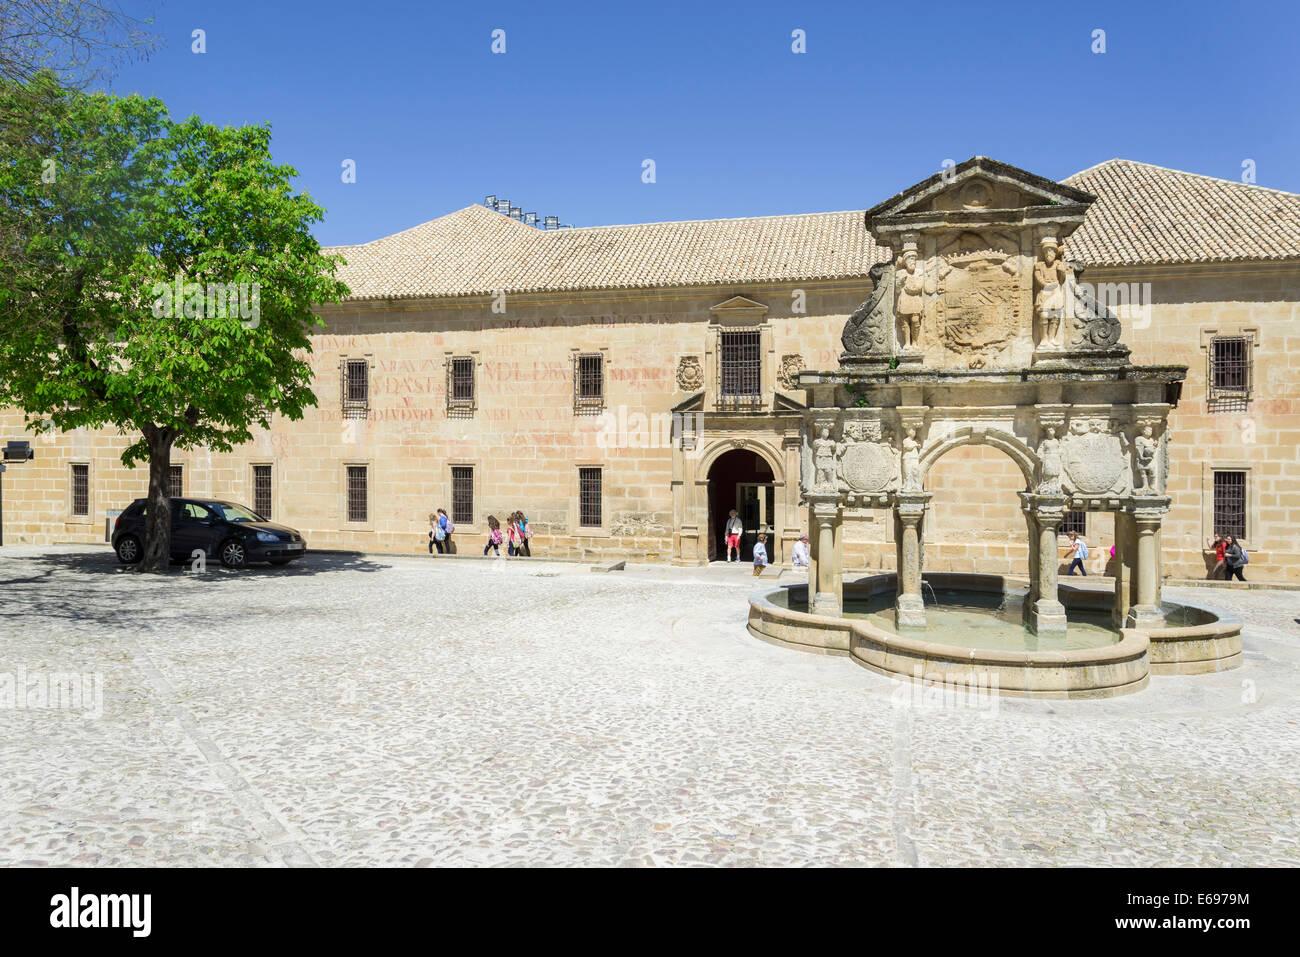 Renaissance fountain, Baeza, Jaén province, Andalucía, Spain Stock Photo